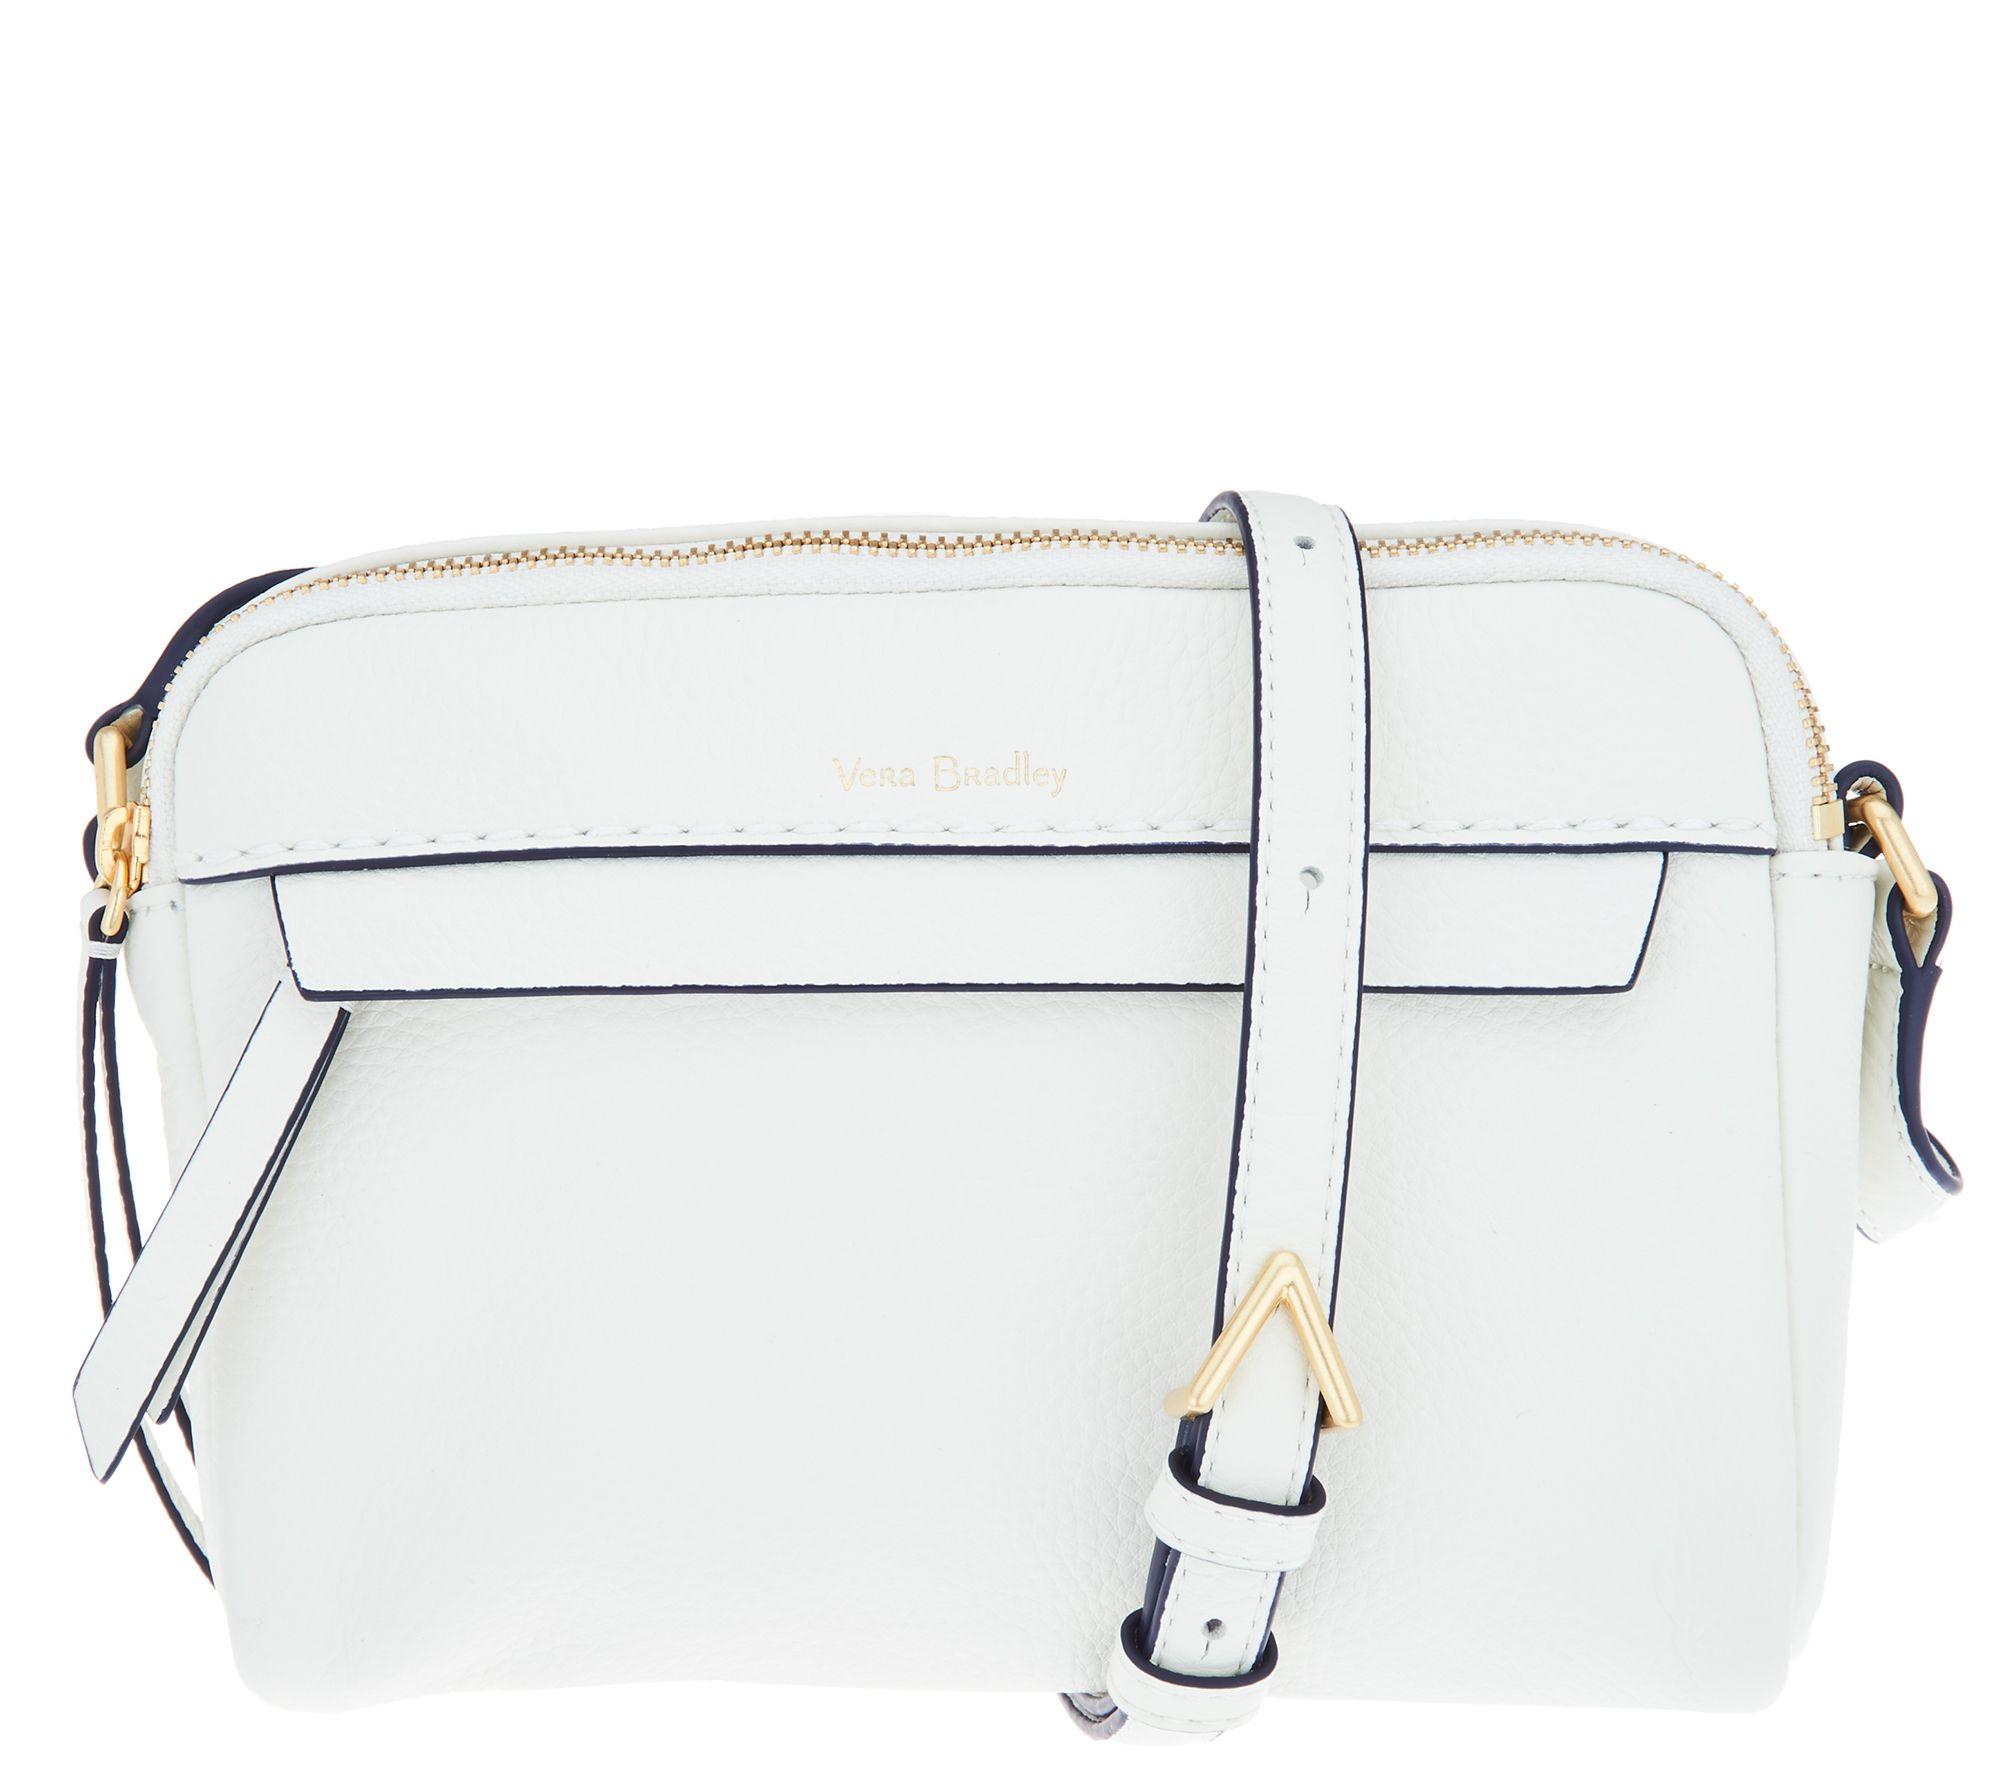 Vera Bradley Leather Mallory Petite RFID Crossbody Bag - Page 1 — QVC.com bbd1179204